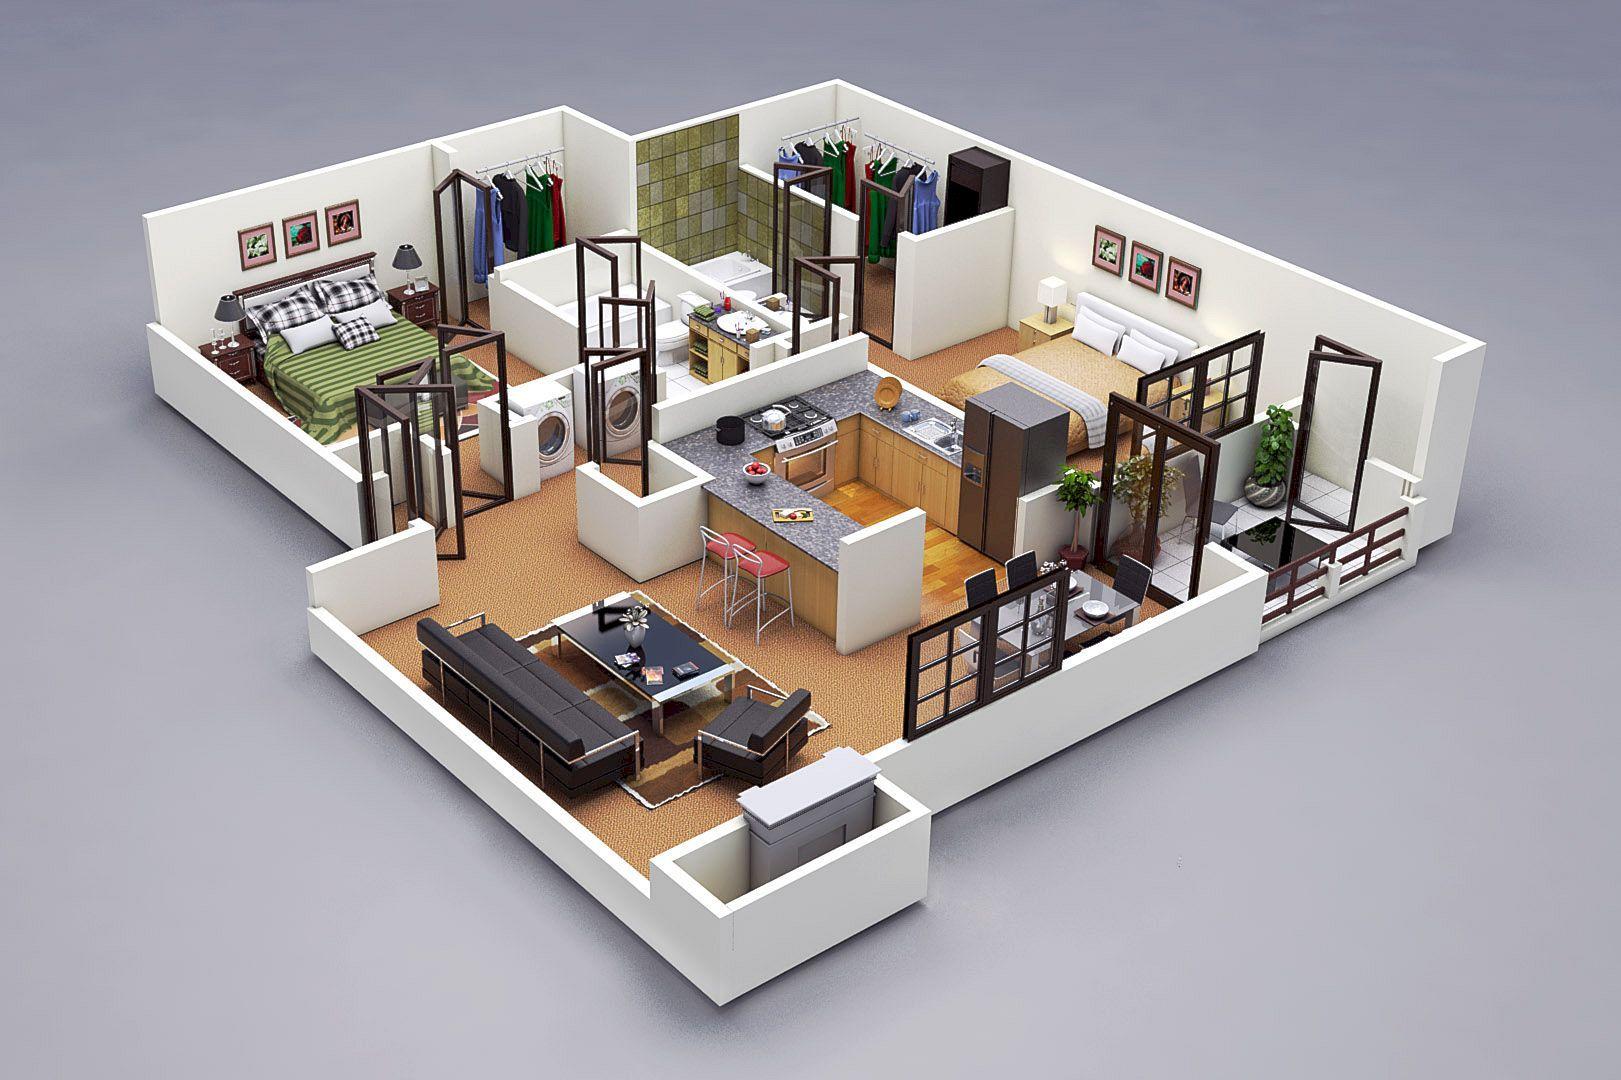 Well Designed 3D House Plan Design Ideas  Https://www.futuristarchitecture.com/23493 3d House Plan.html